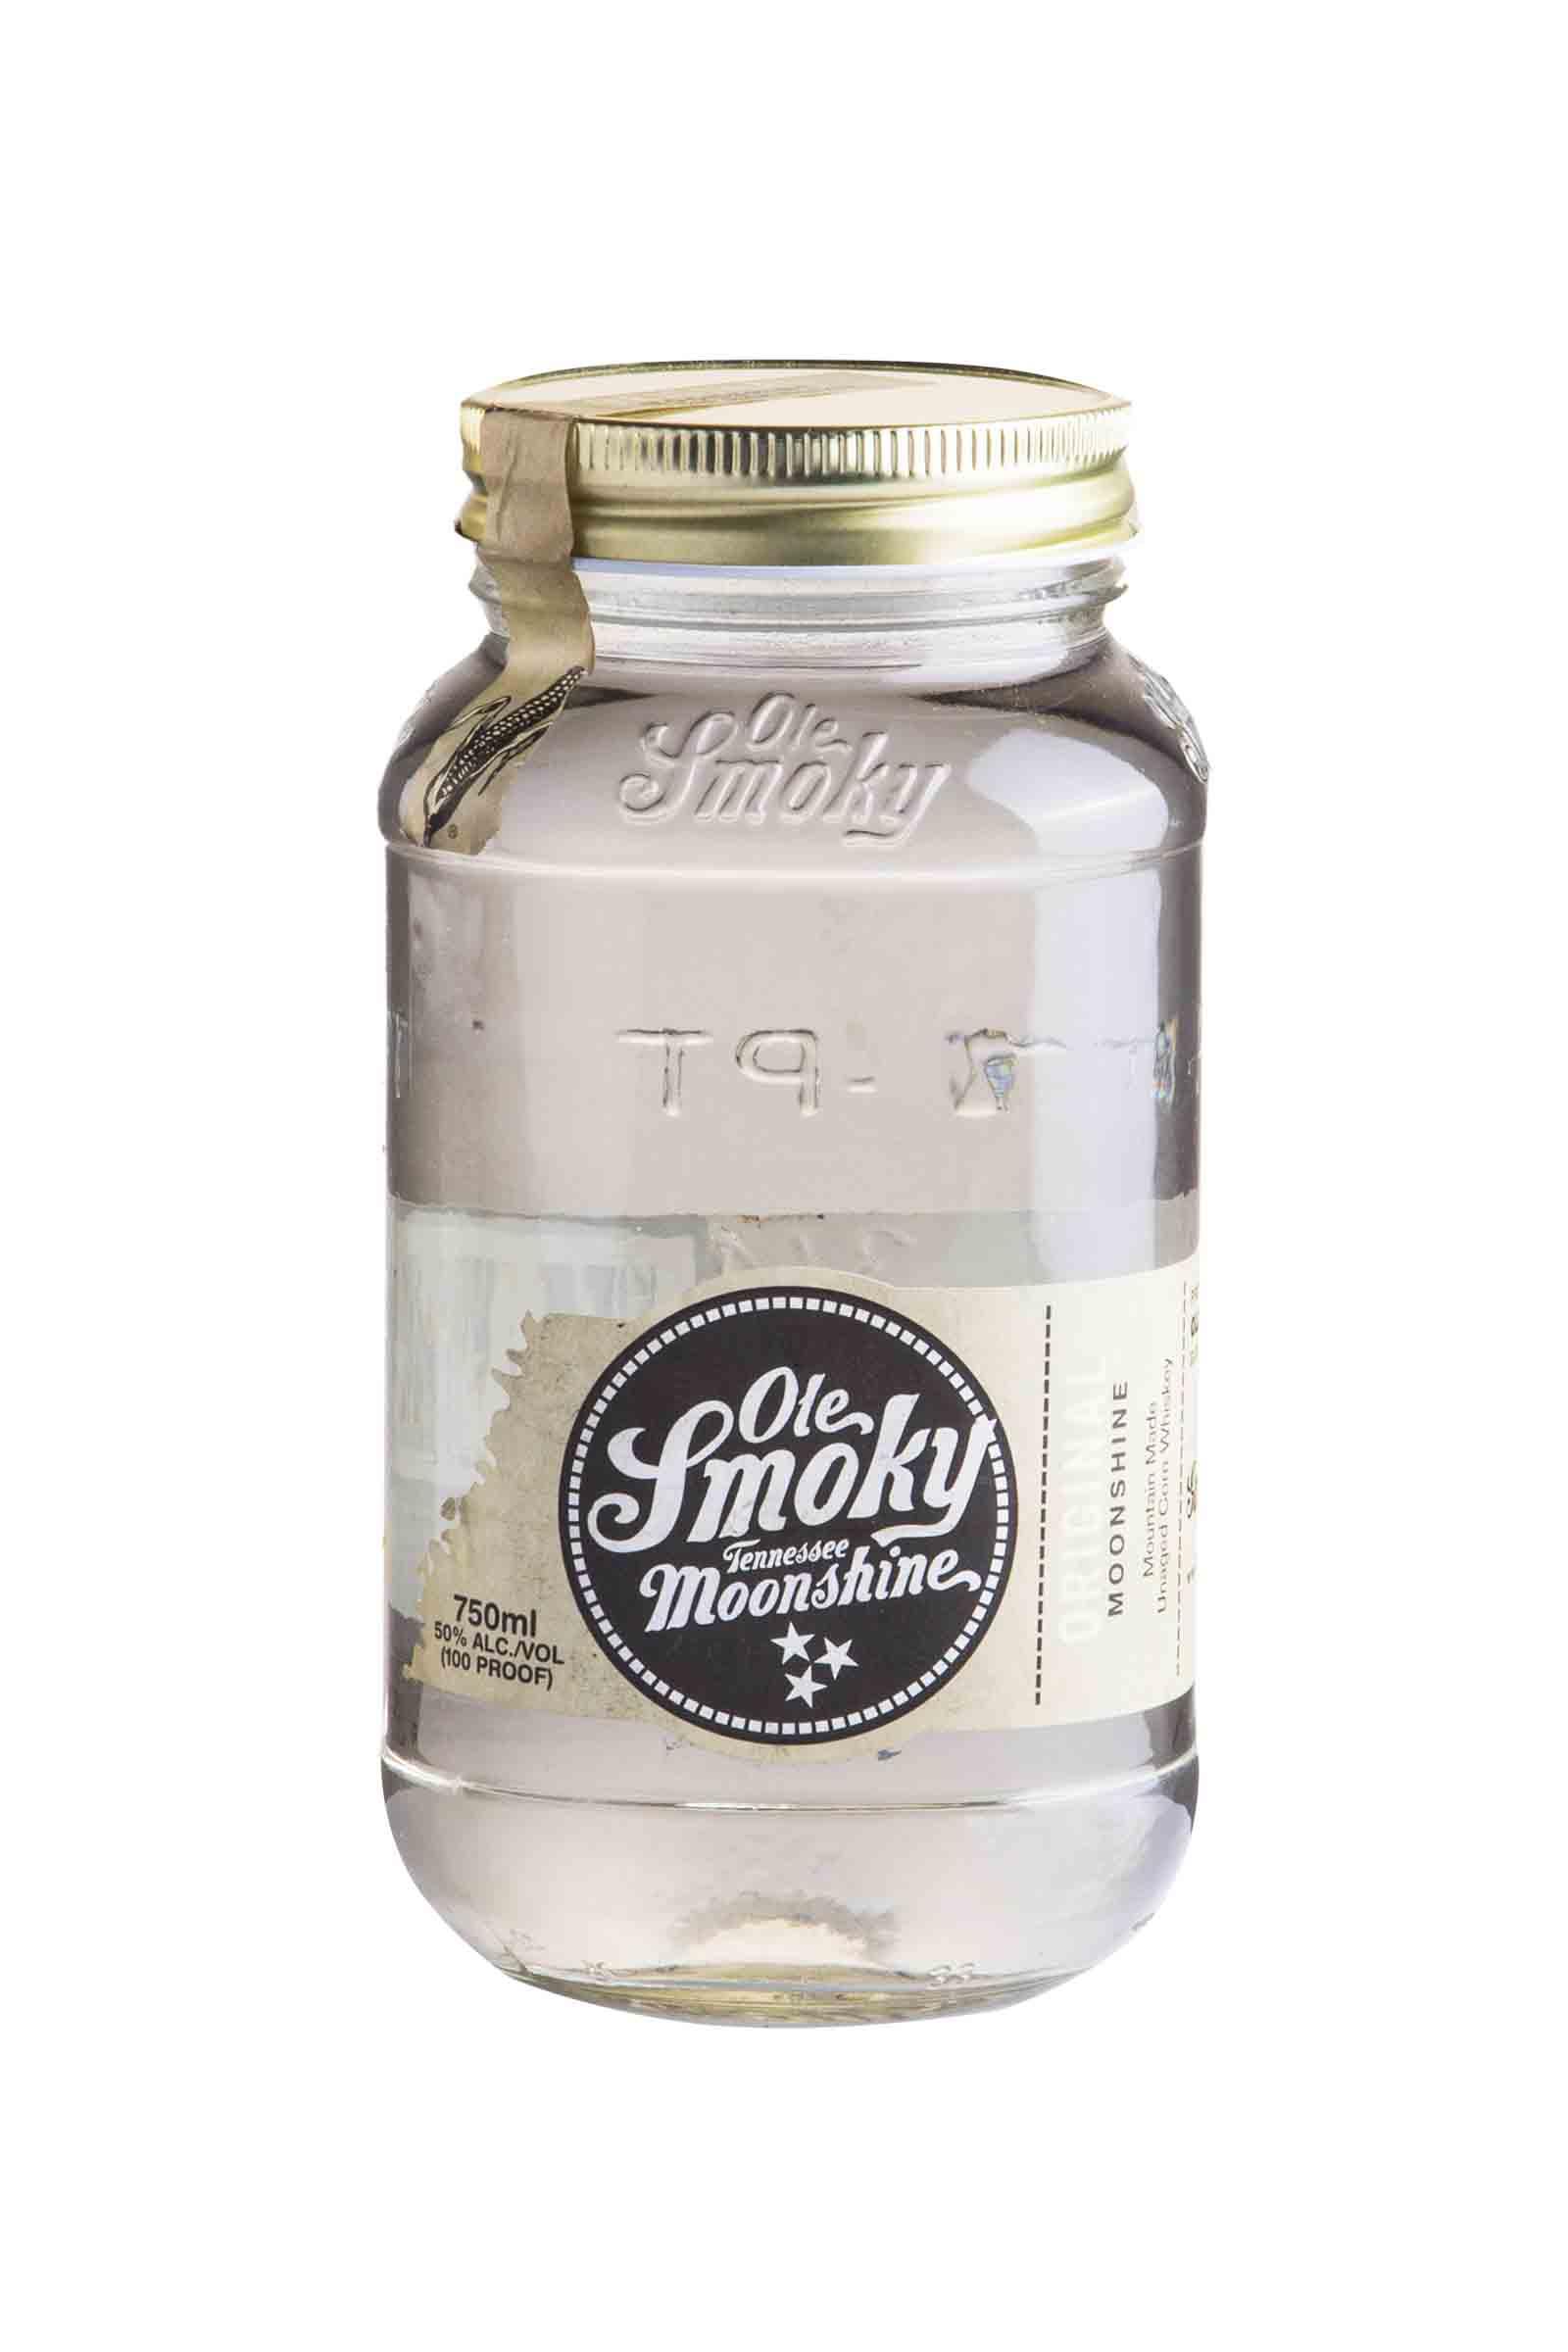 Ole Smoky Tennessee Original Moonshine 750ml